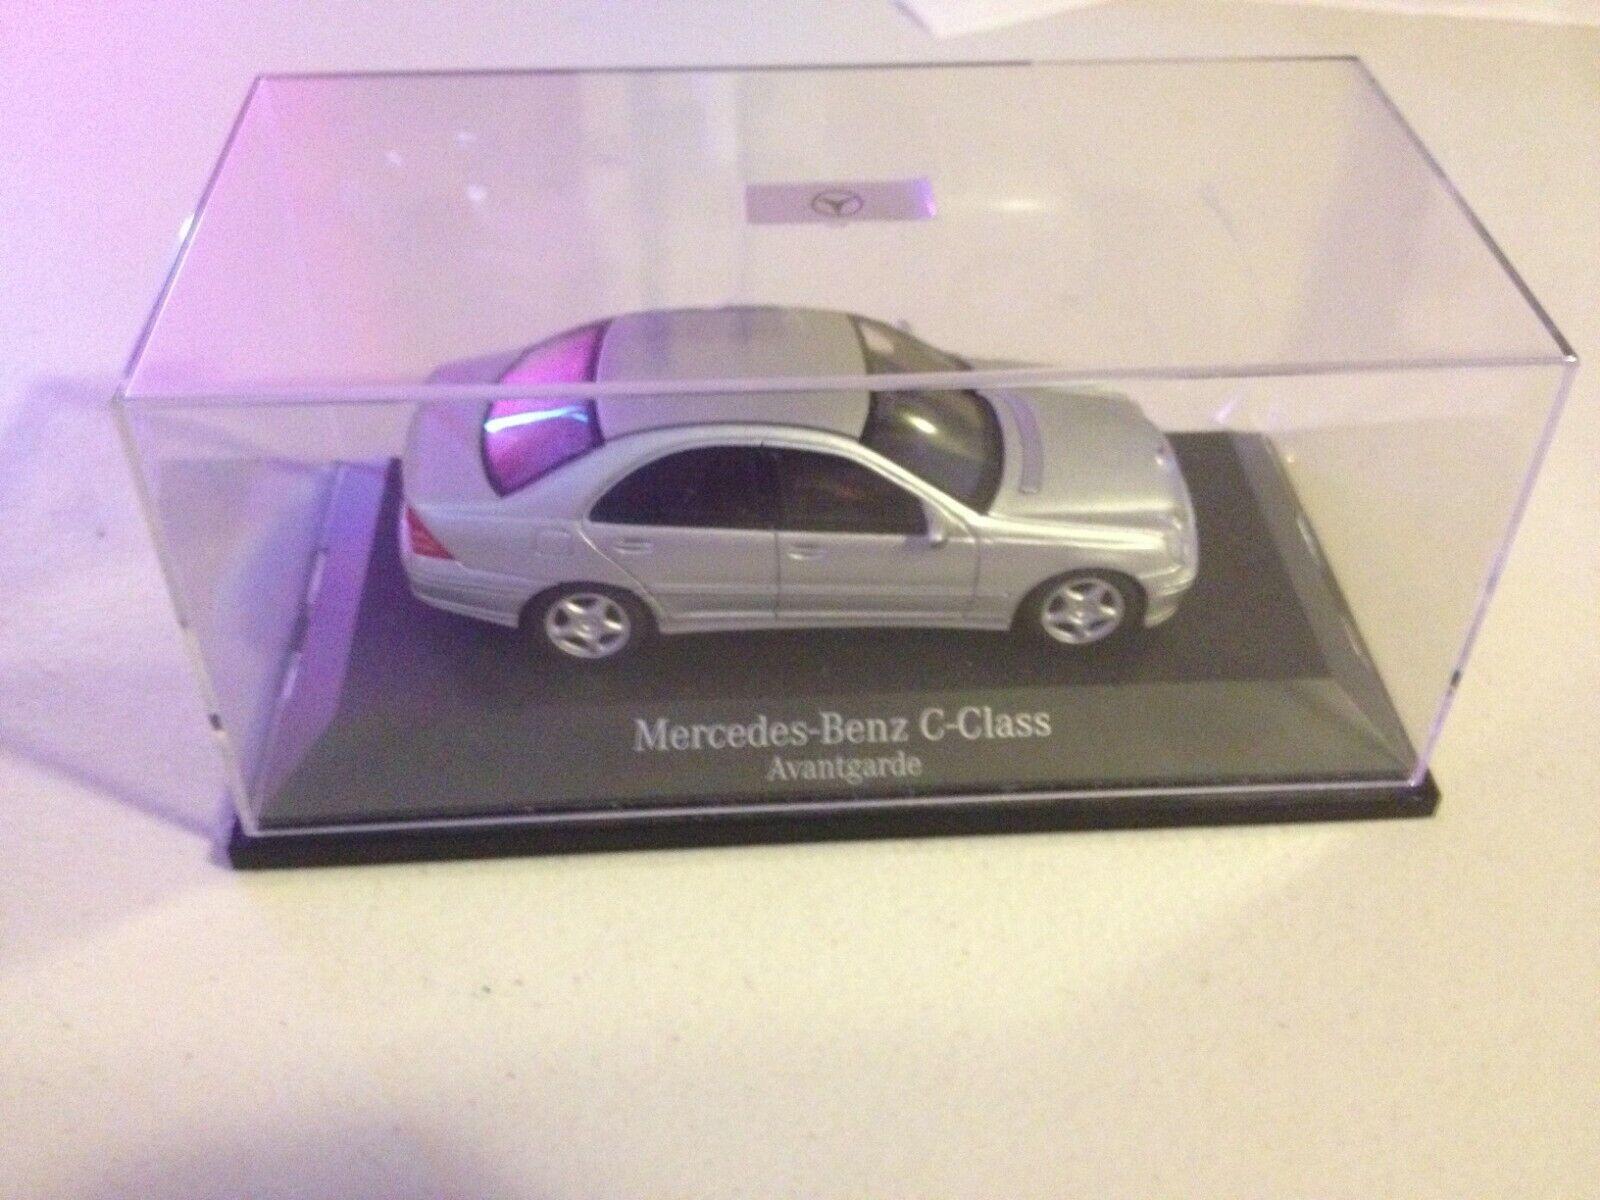 2013 Mercedes C-Klasse Avantgarde Schuco 1 43 Free Shipping